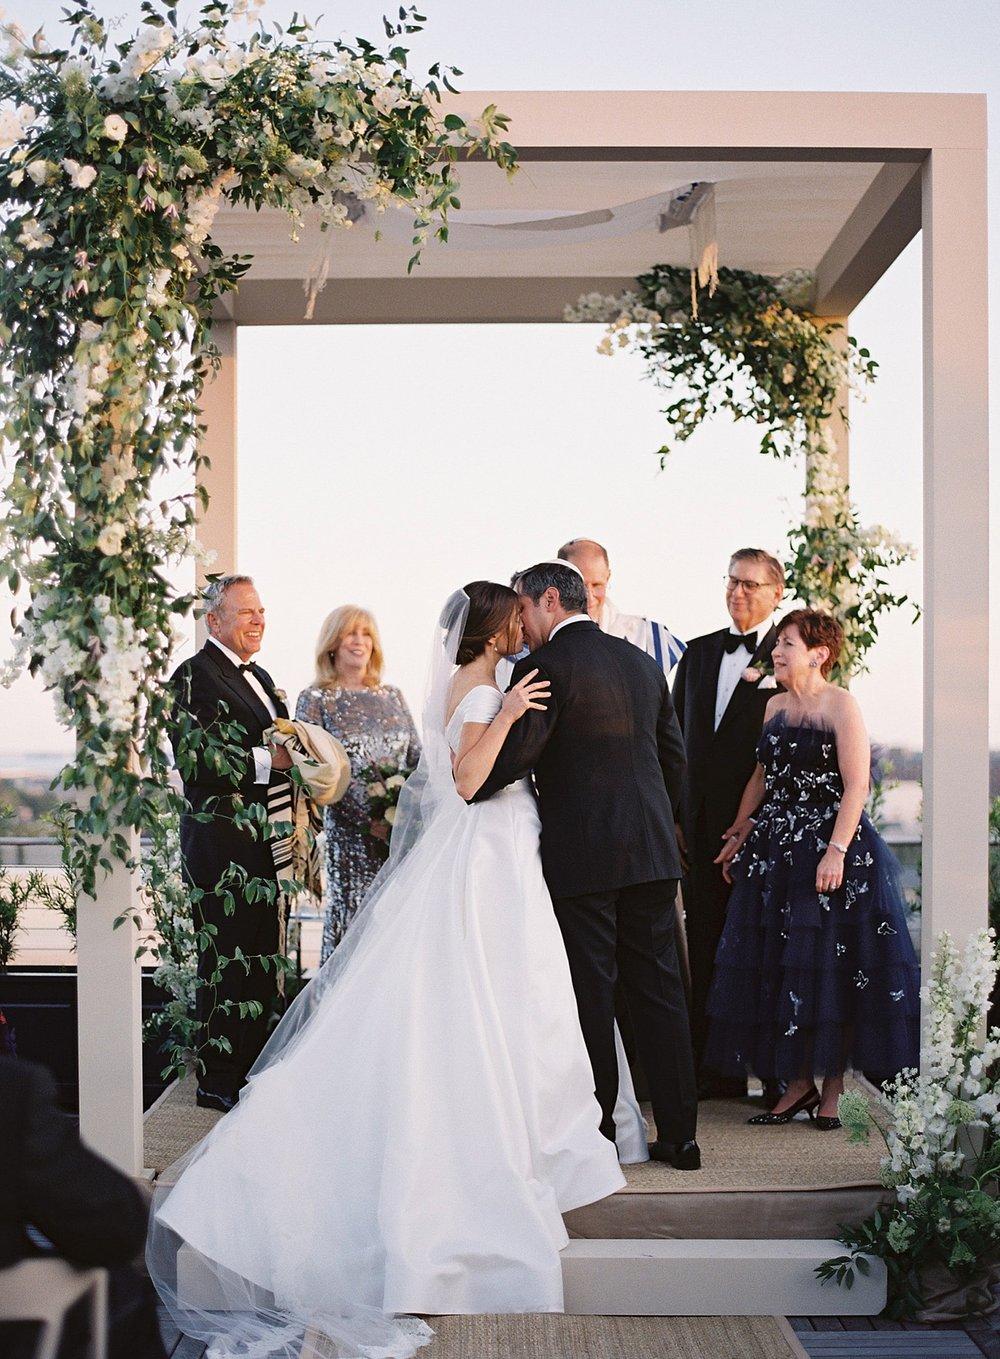 15_dewberry_charleston_wedding.jpg